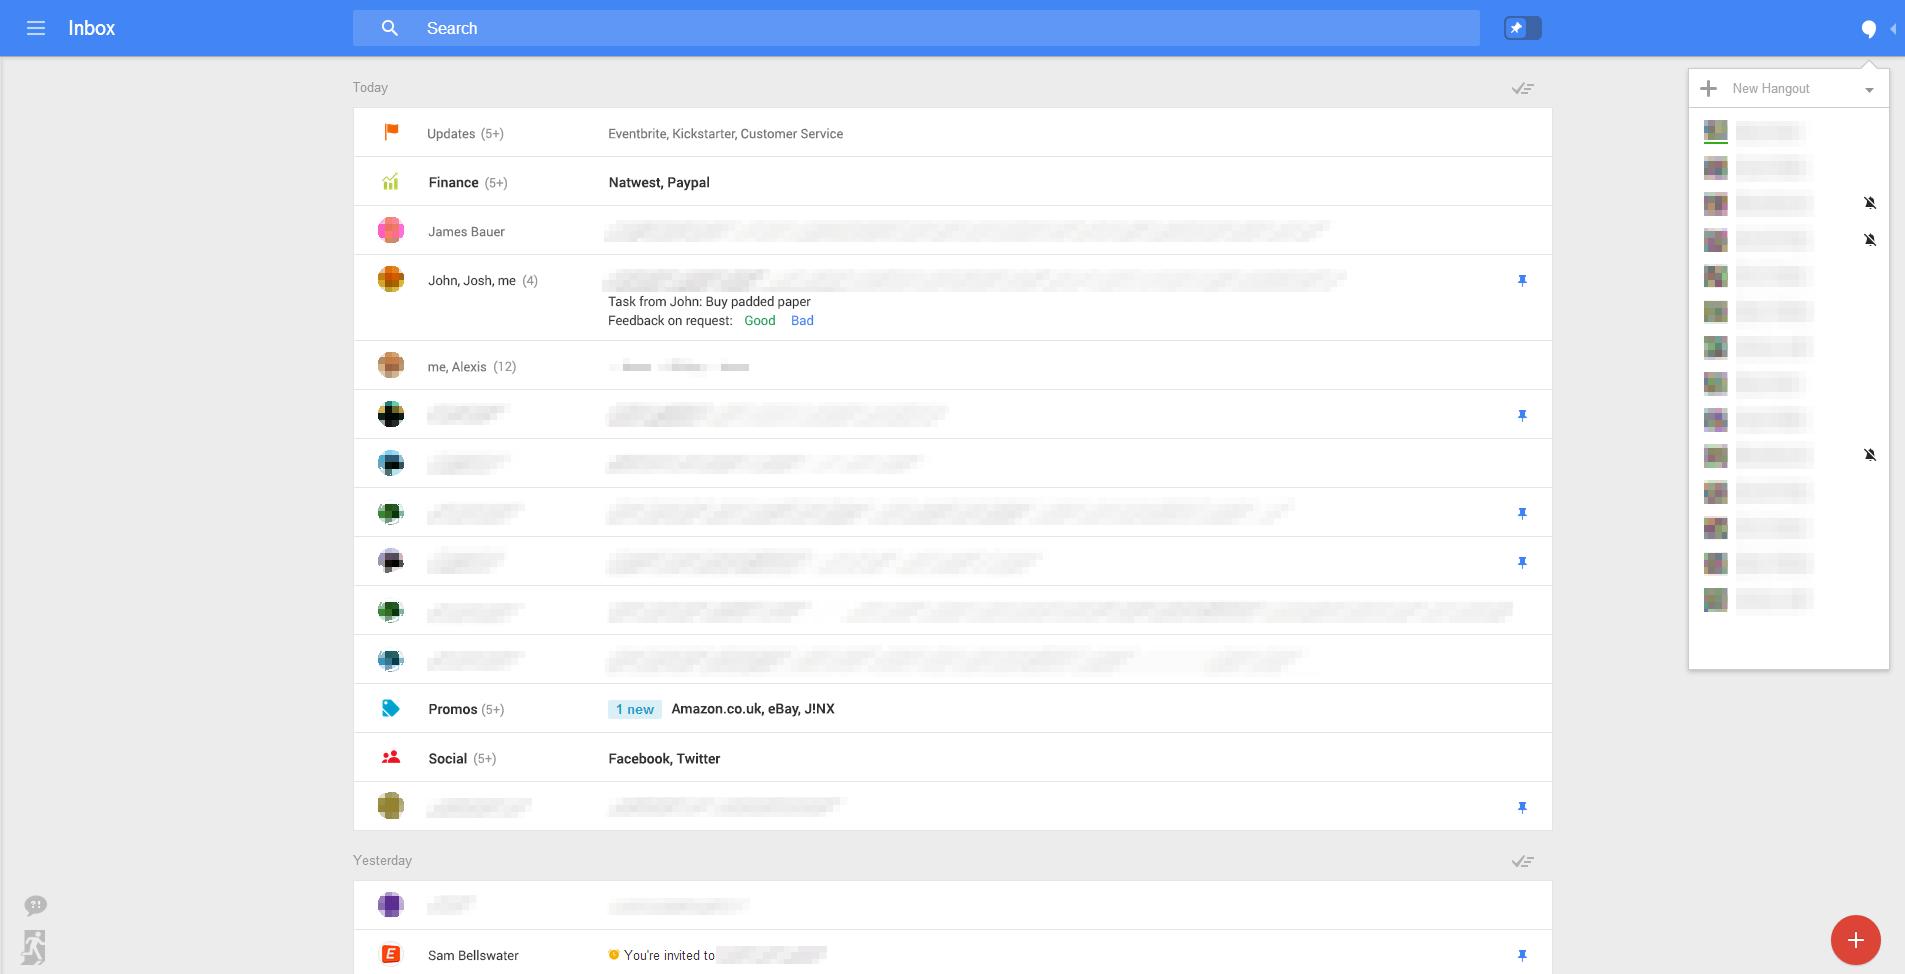 google-gmail-test-tasarim-110514-3